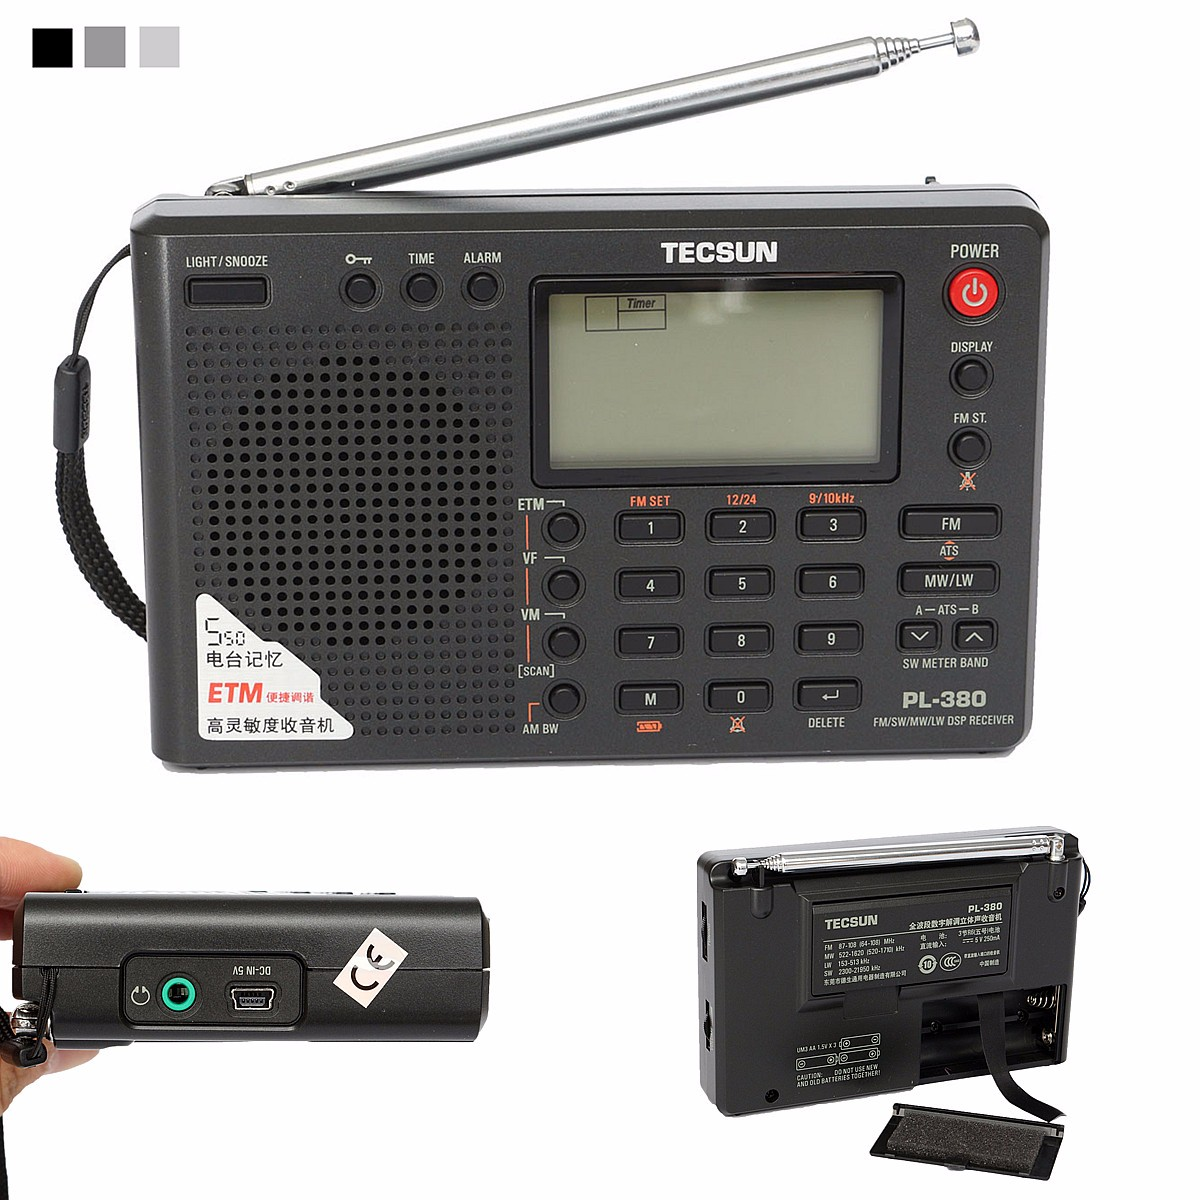 TECSUN PL-380 DSP PLL FM MW SW LW Digital Stereo Radio Welt-Band Empfänger Neue 3 Farben 7 Tuning modus Wählbar 135x86x29mm